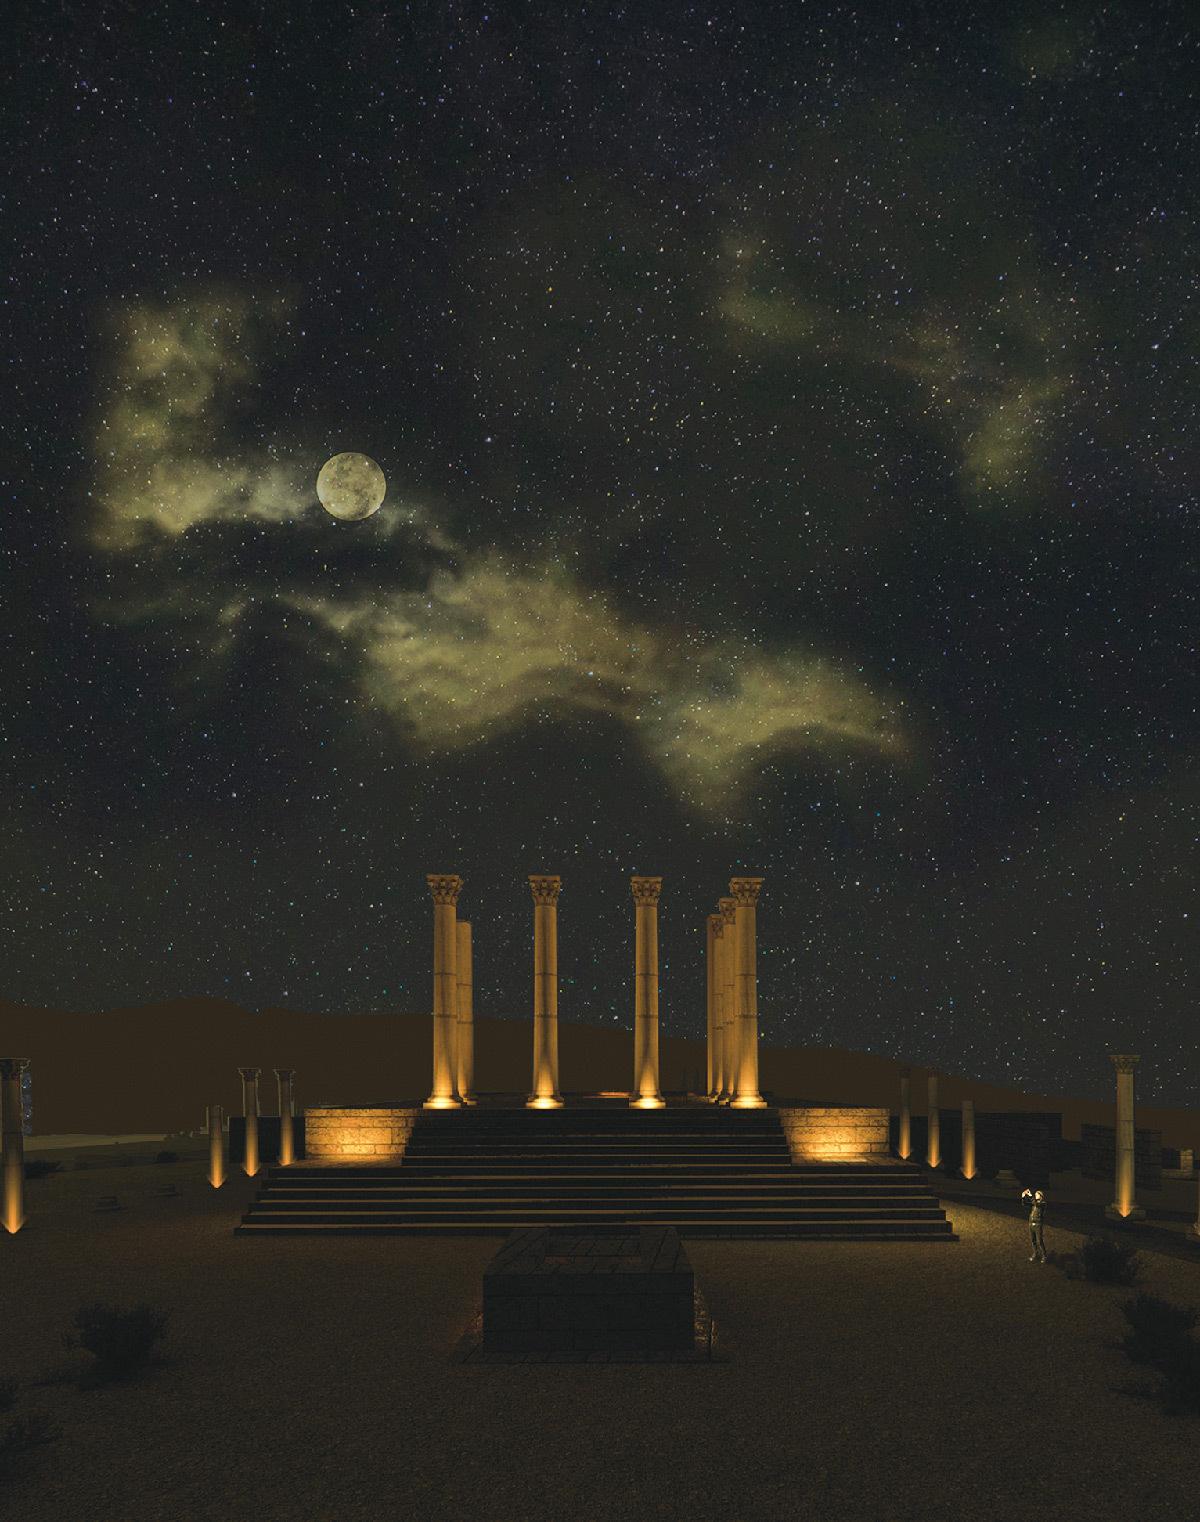 Simulation lumière, capitole, Volubilis, Maroc - Tifawine Light Contest, Illuminate, équipe 14 © Mahmoud Ramdane et Soukaina Kssili